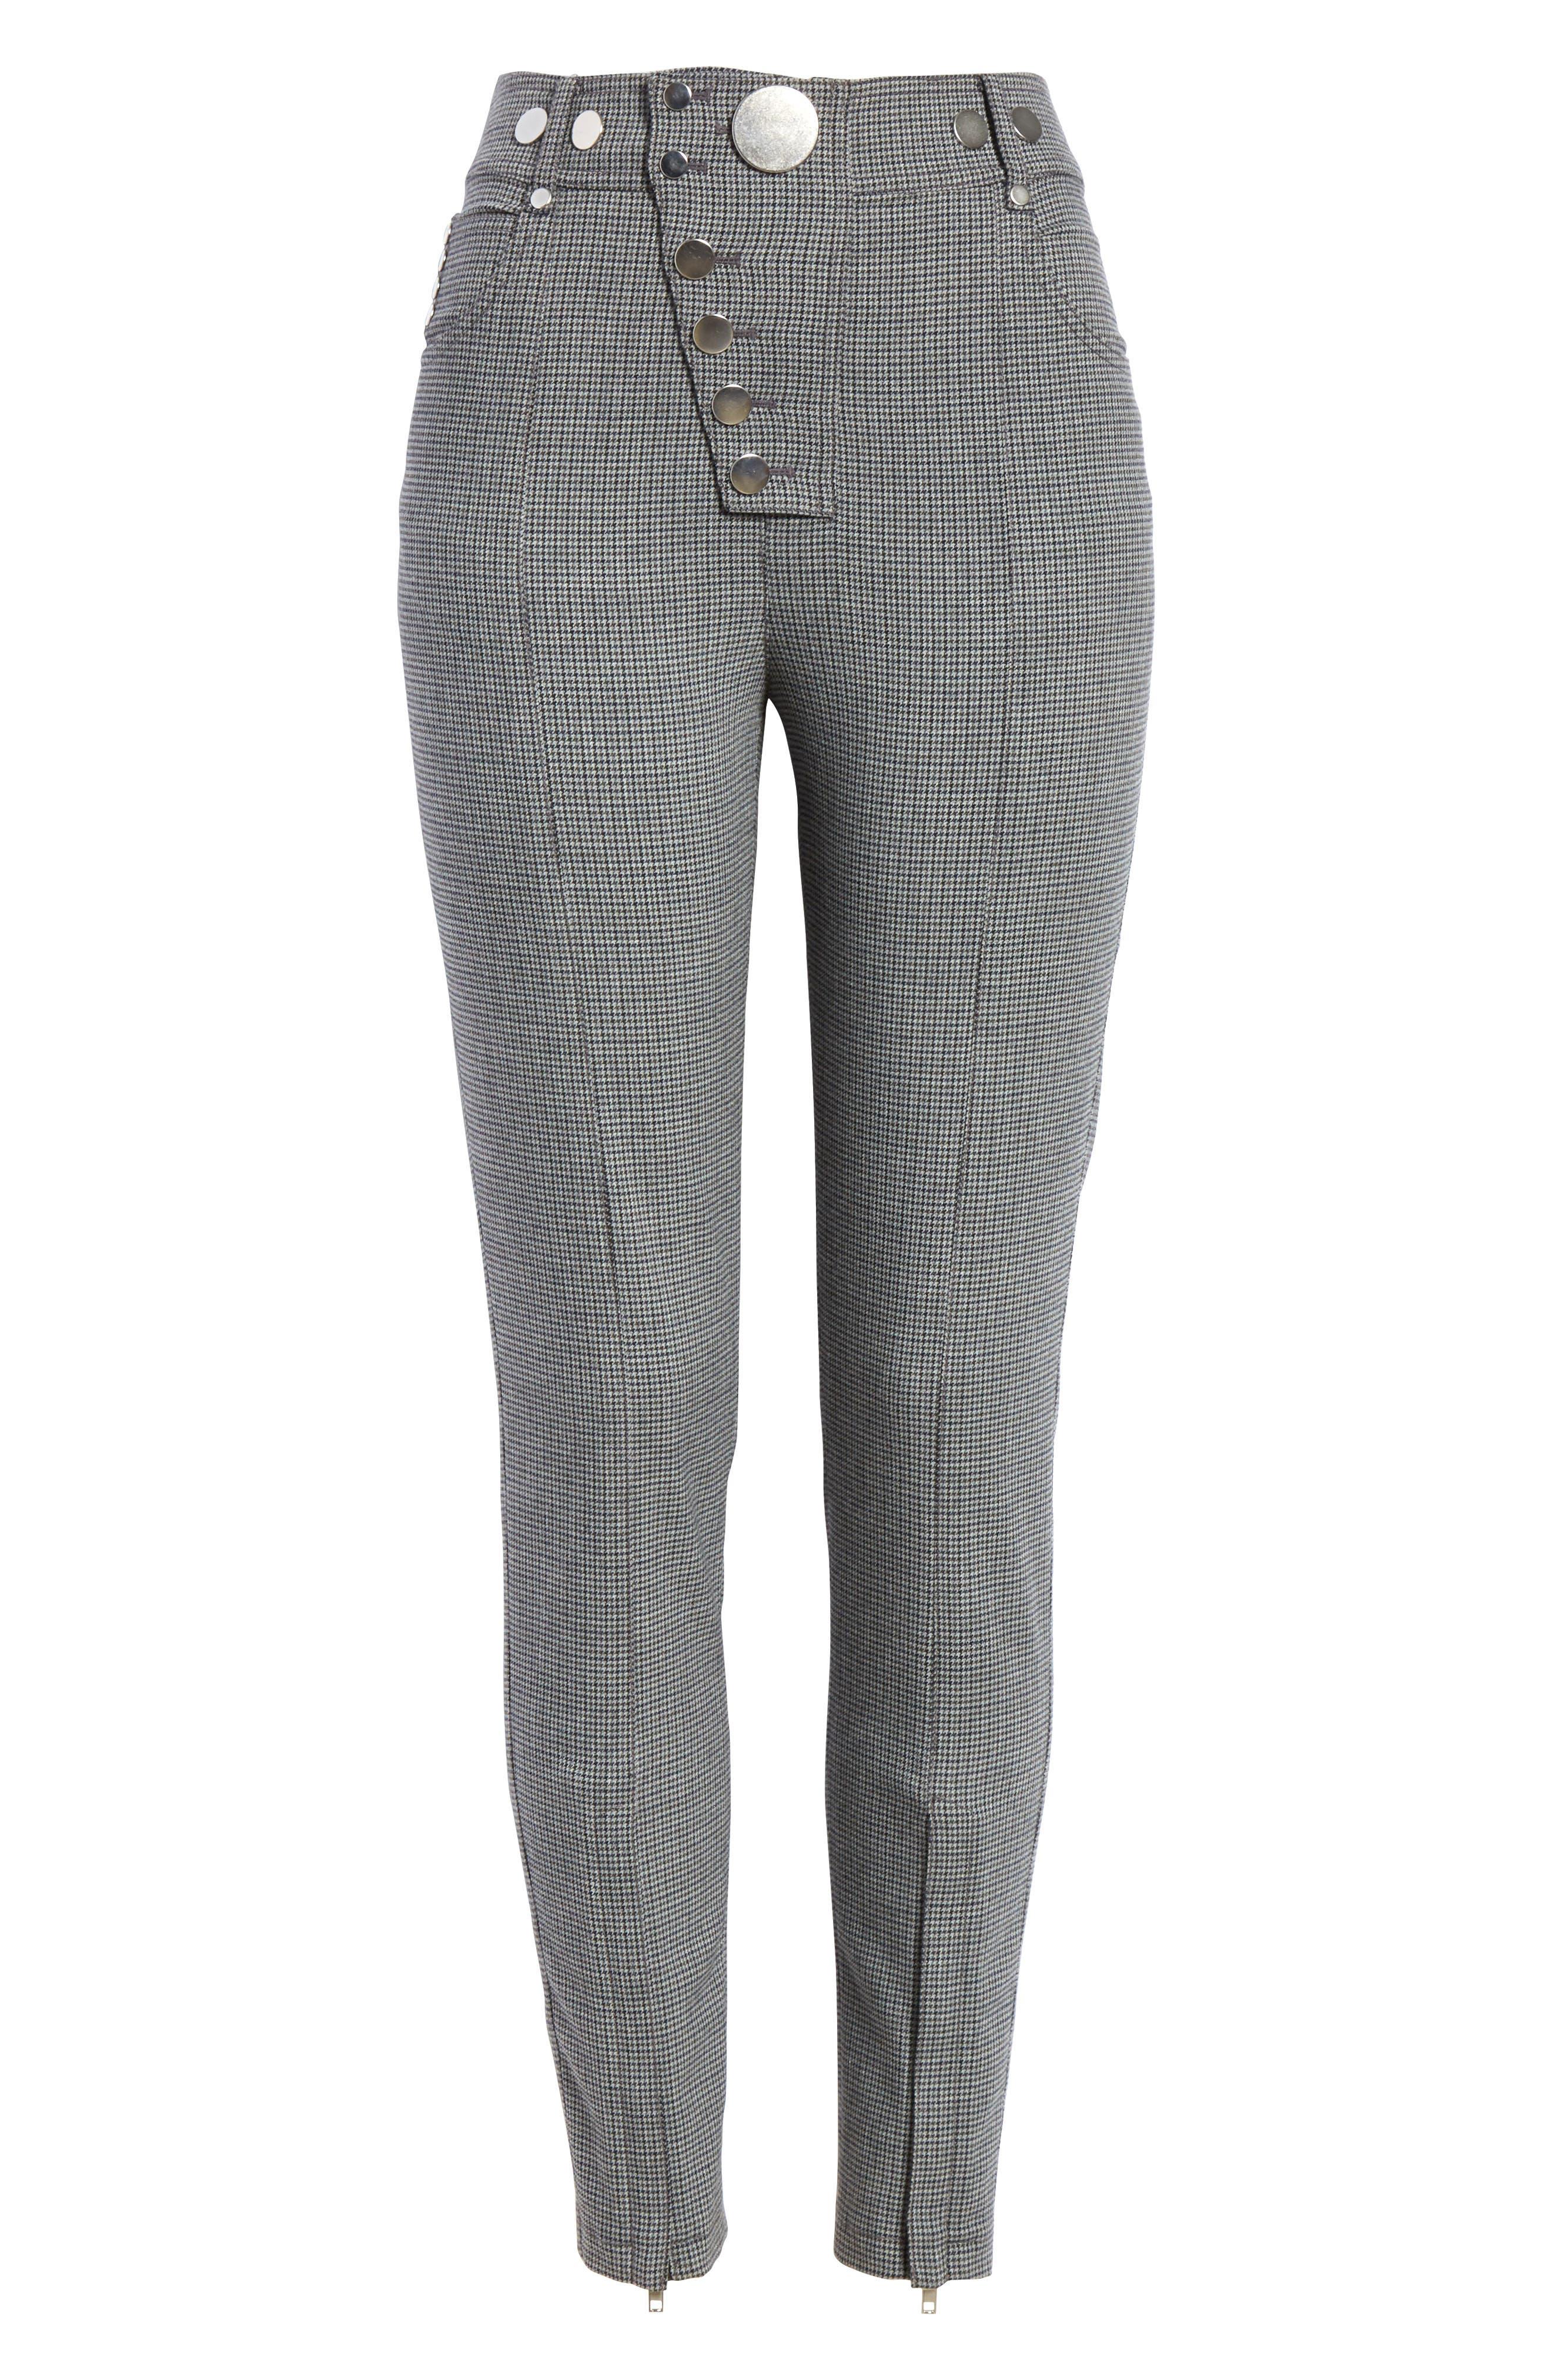 ALEXANDER WANG,                             Skinny Plaid Pants,                             Alternate thumbnail 6, color,                             020